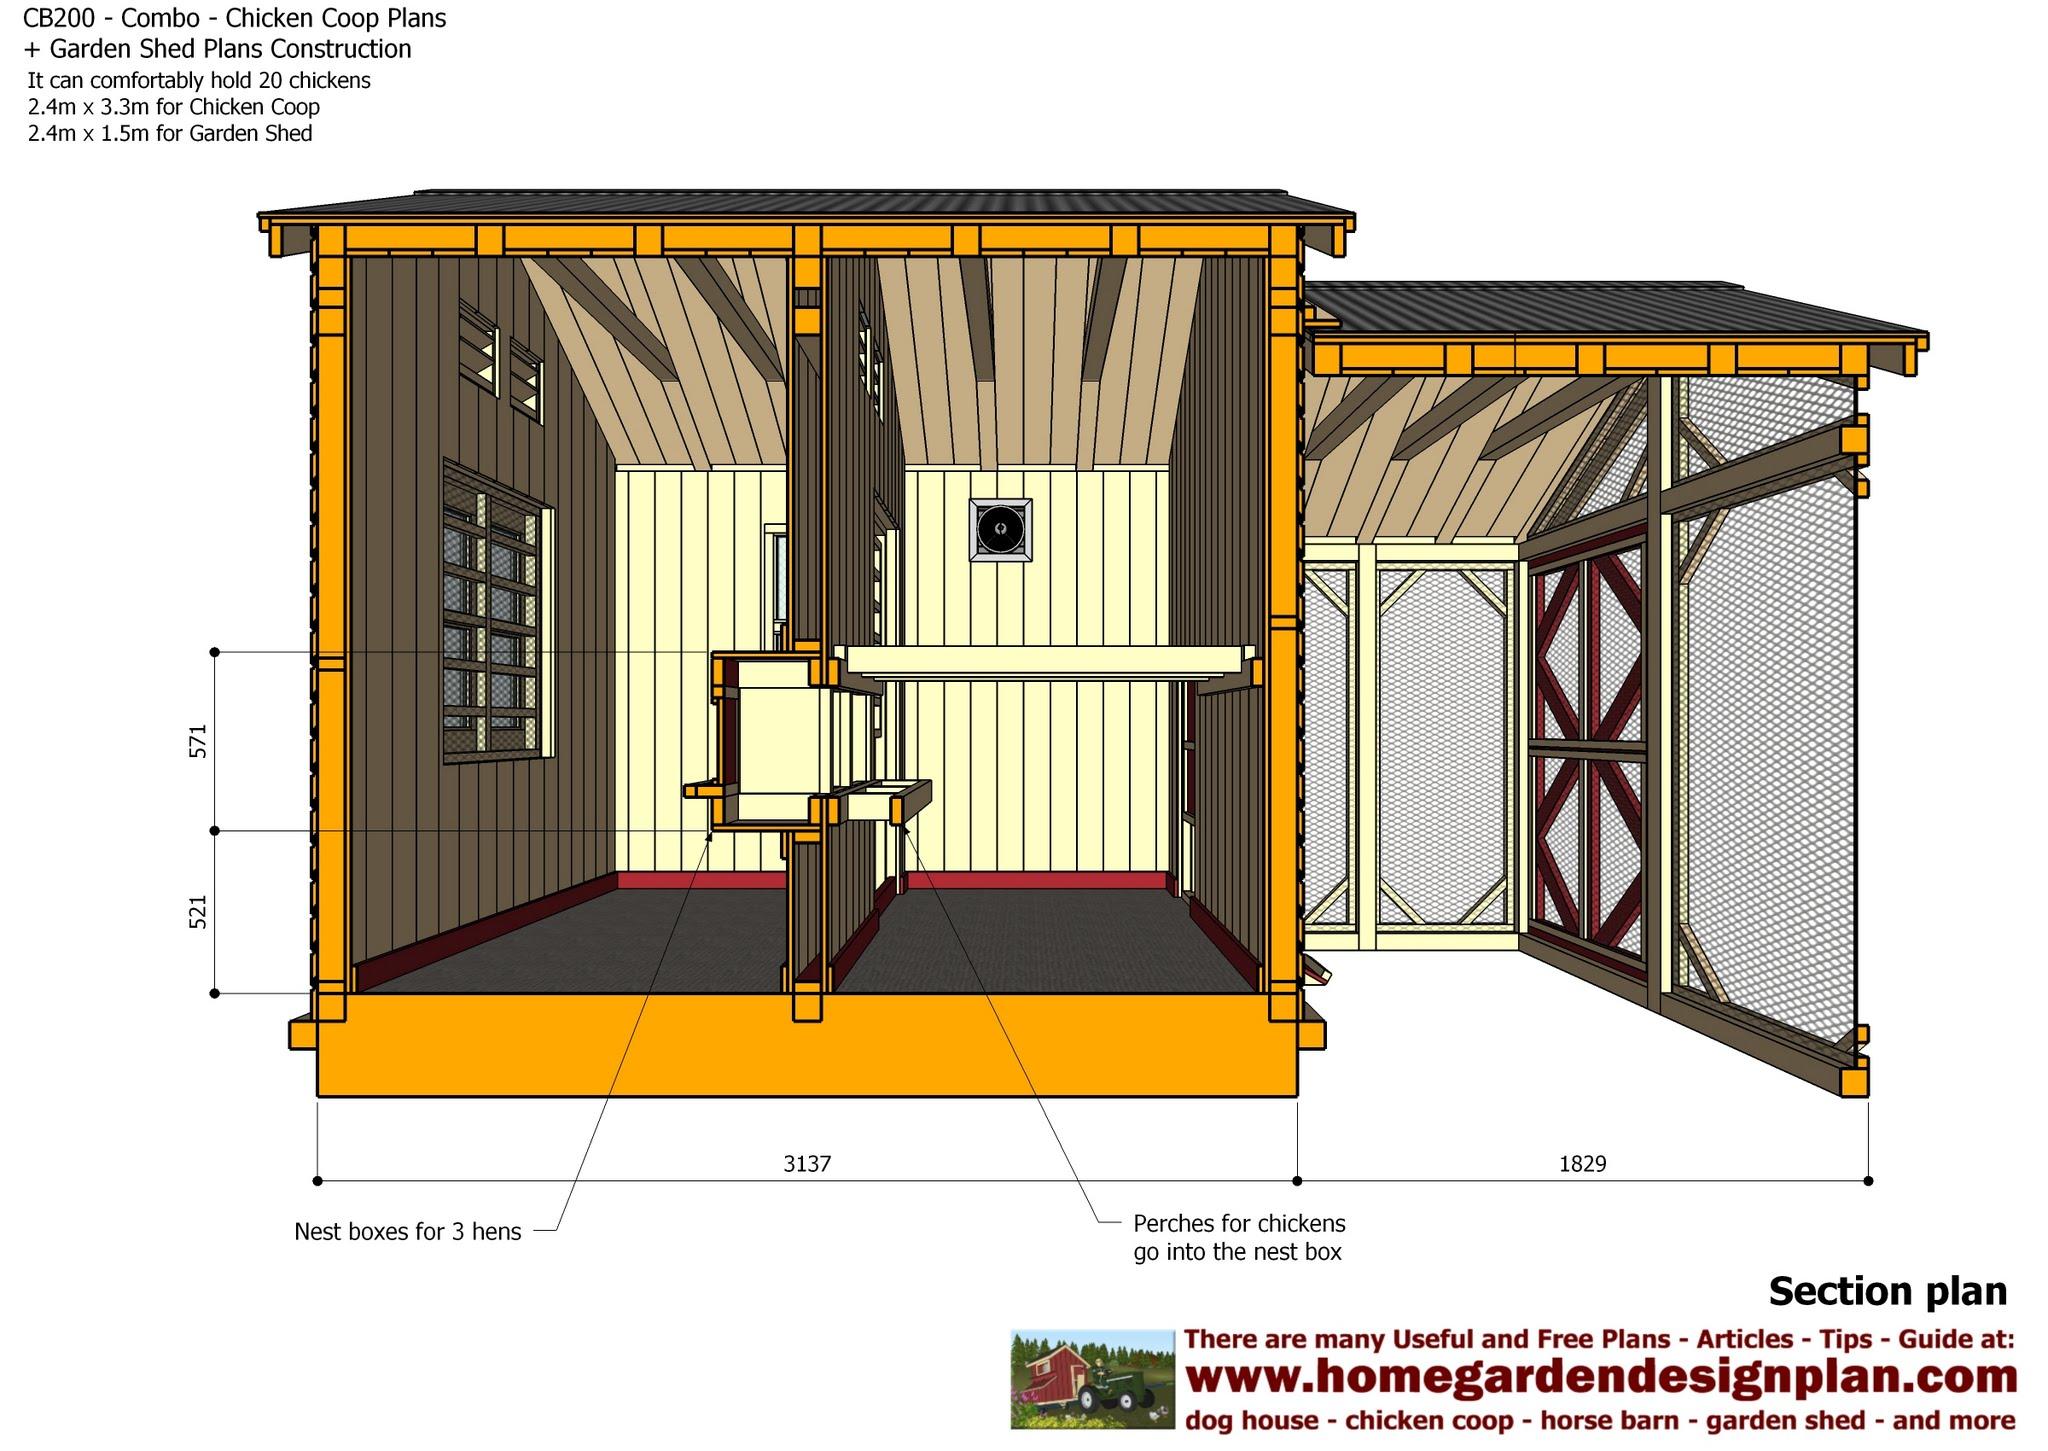 Garden Sheds 2 X 3 cb200 - combo plans - chicken coop plans + garden sheds - storage